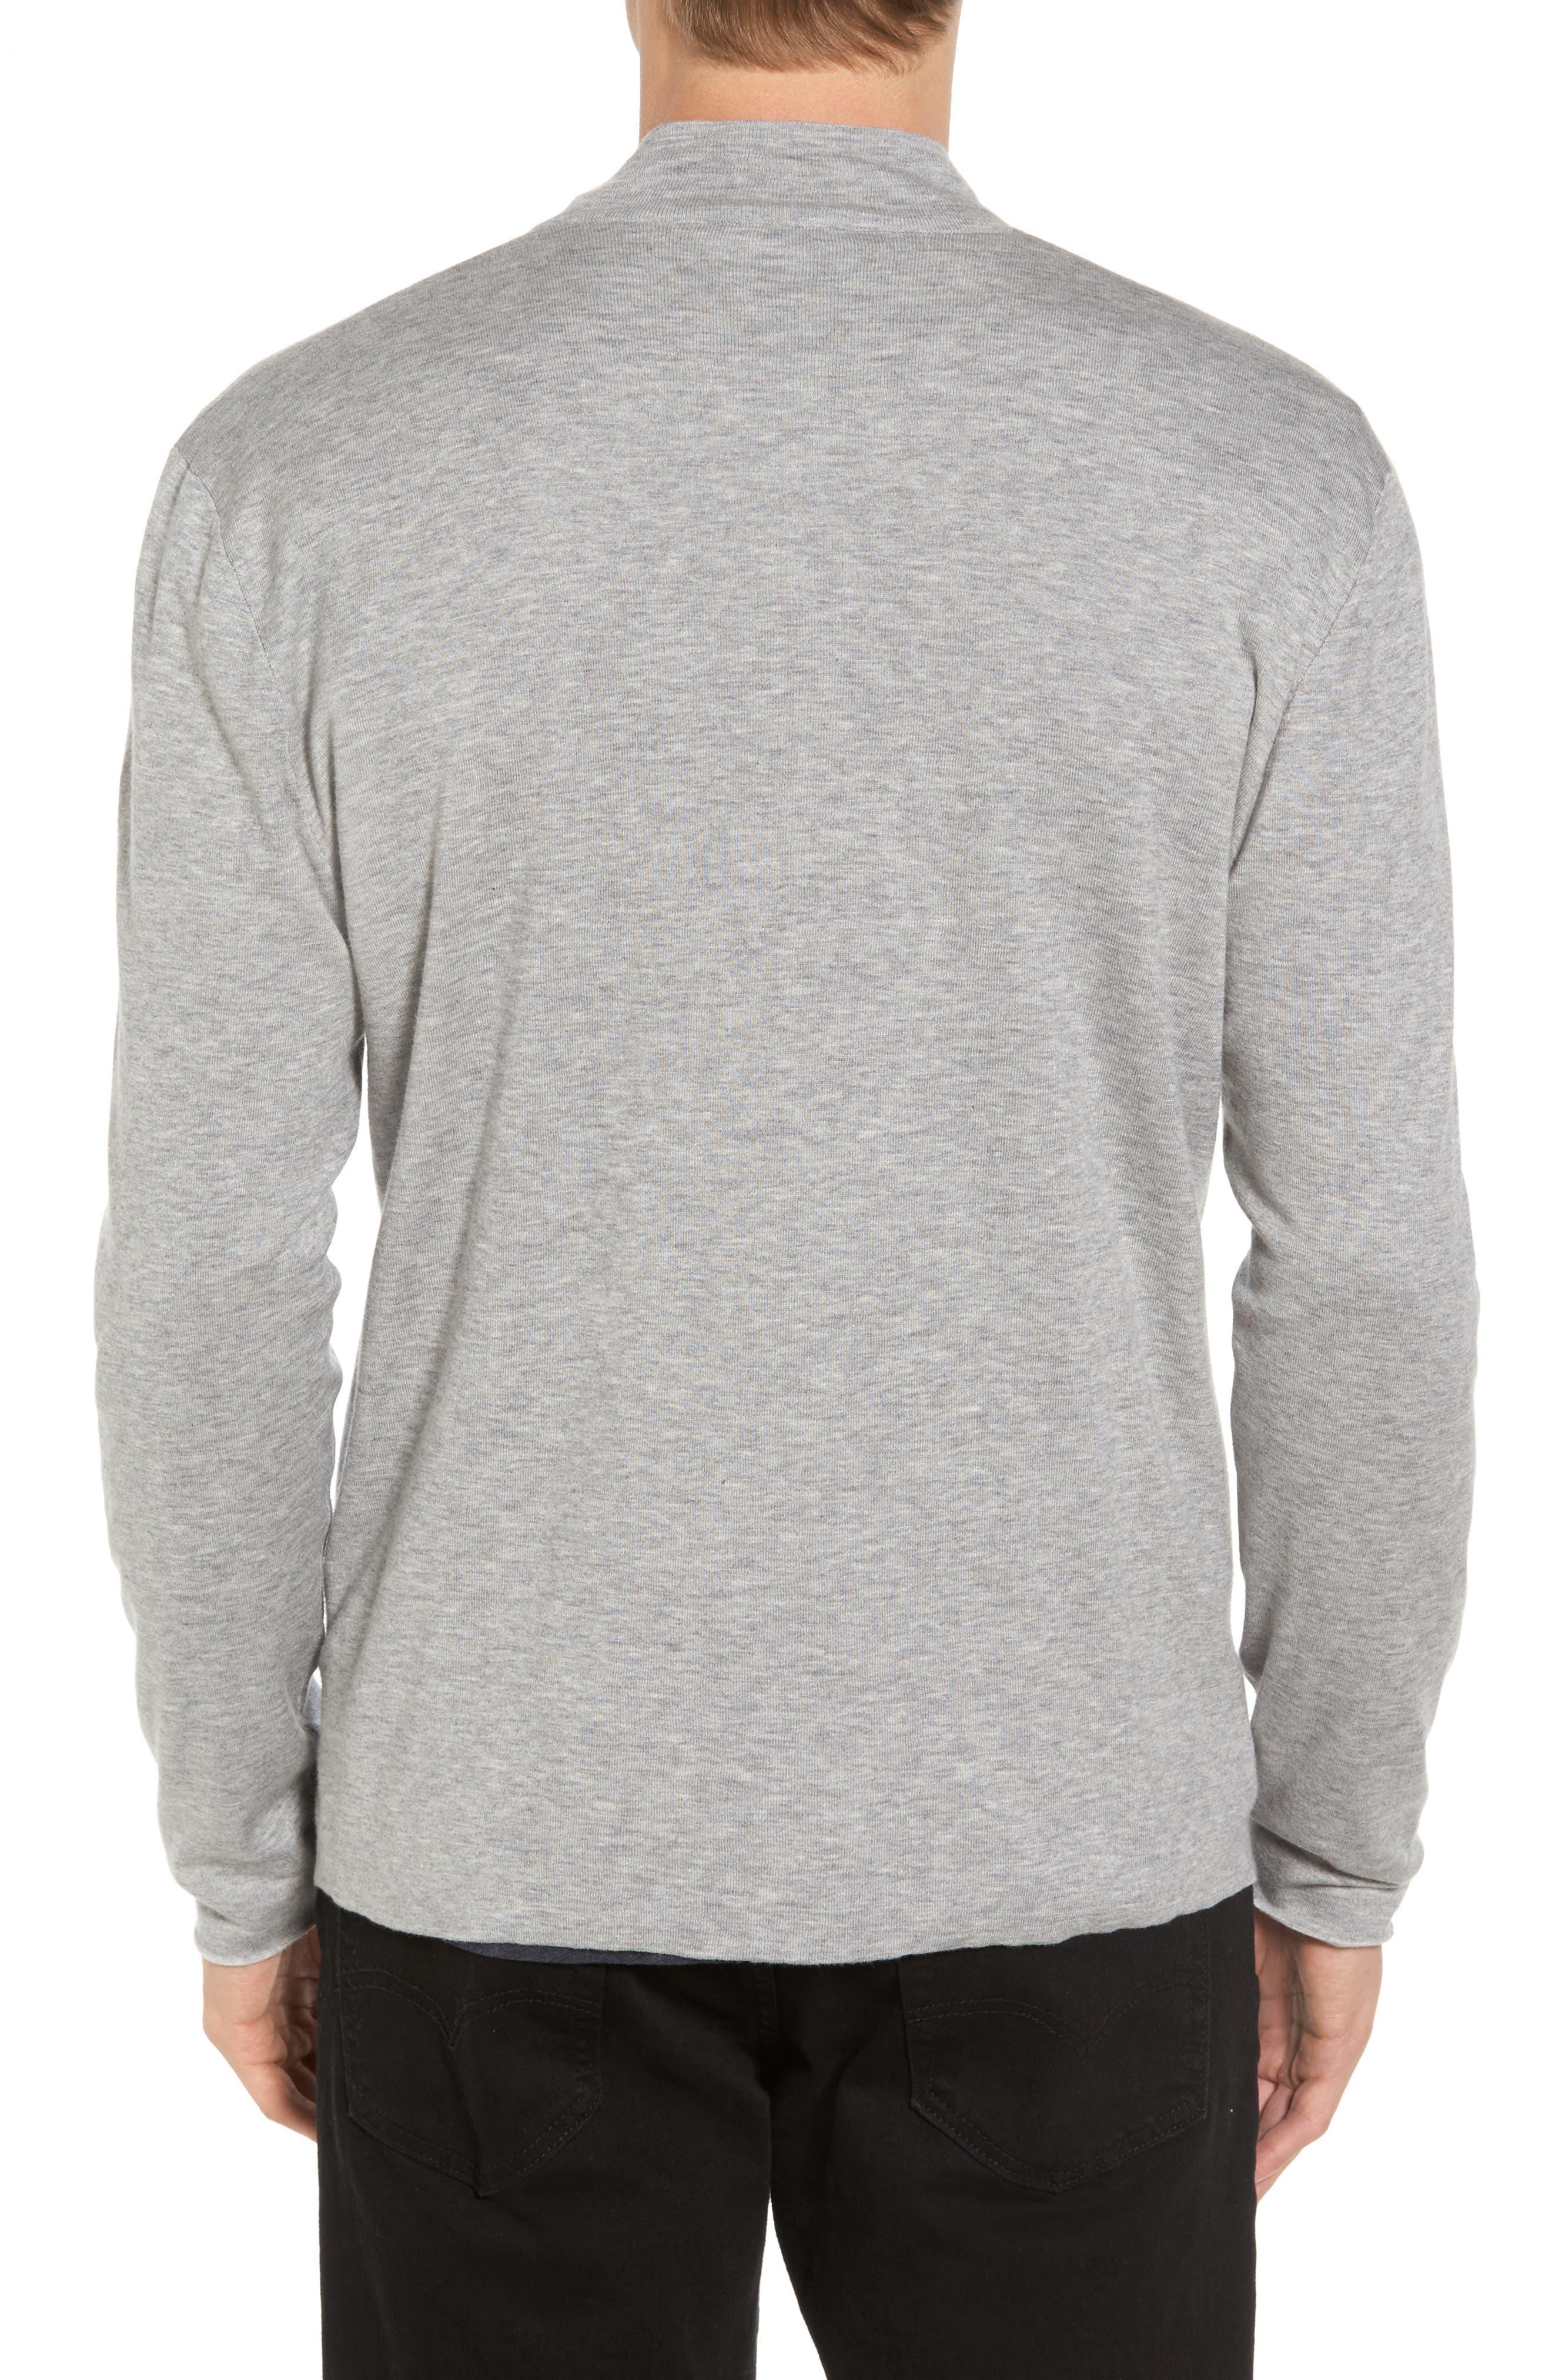 Mock Neck Zip Sweatshirt,                             Alternate thumbnail 2, color,                             Heather Grey/ Platinum